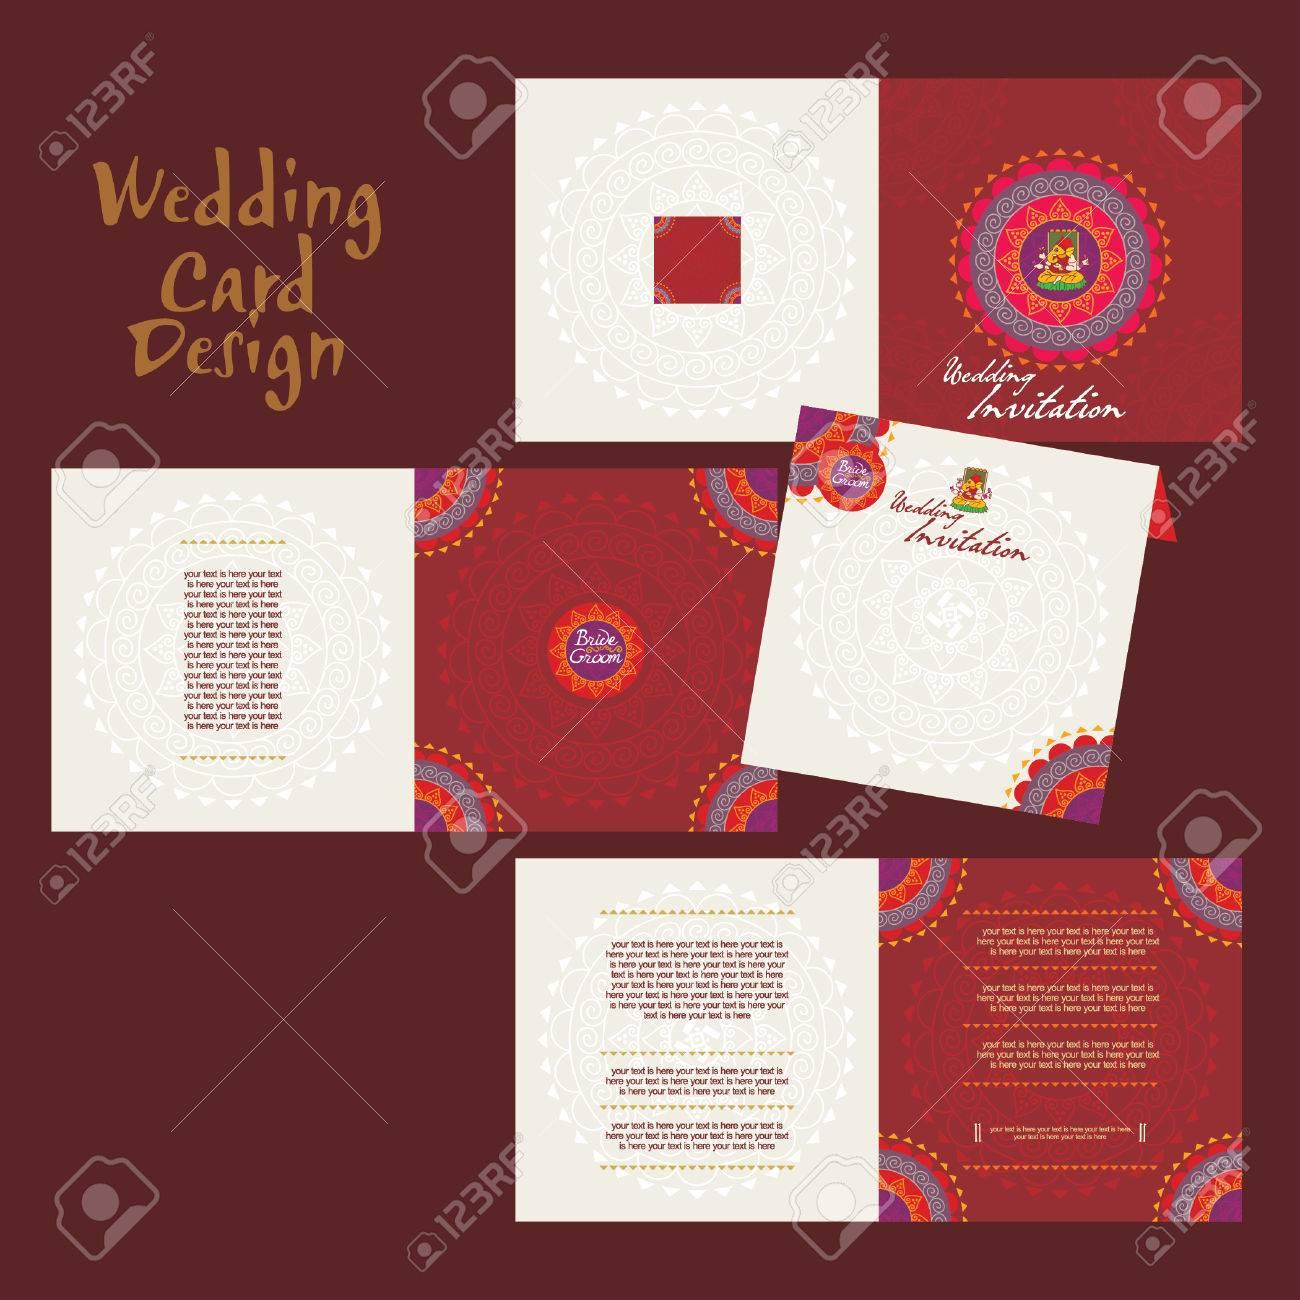 Indian Wedding Card Concept Vector Royalty Free Cliparts, Vectors ...